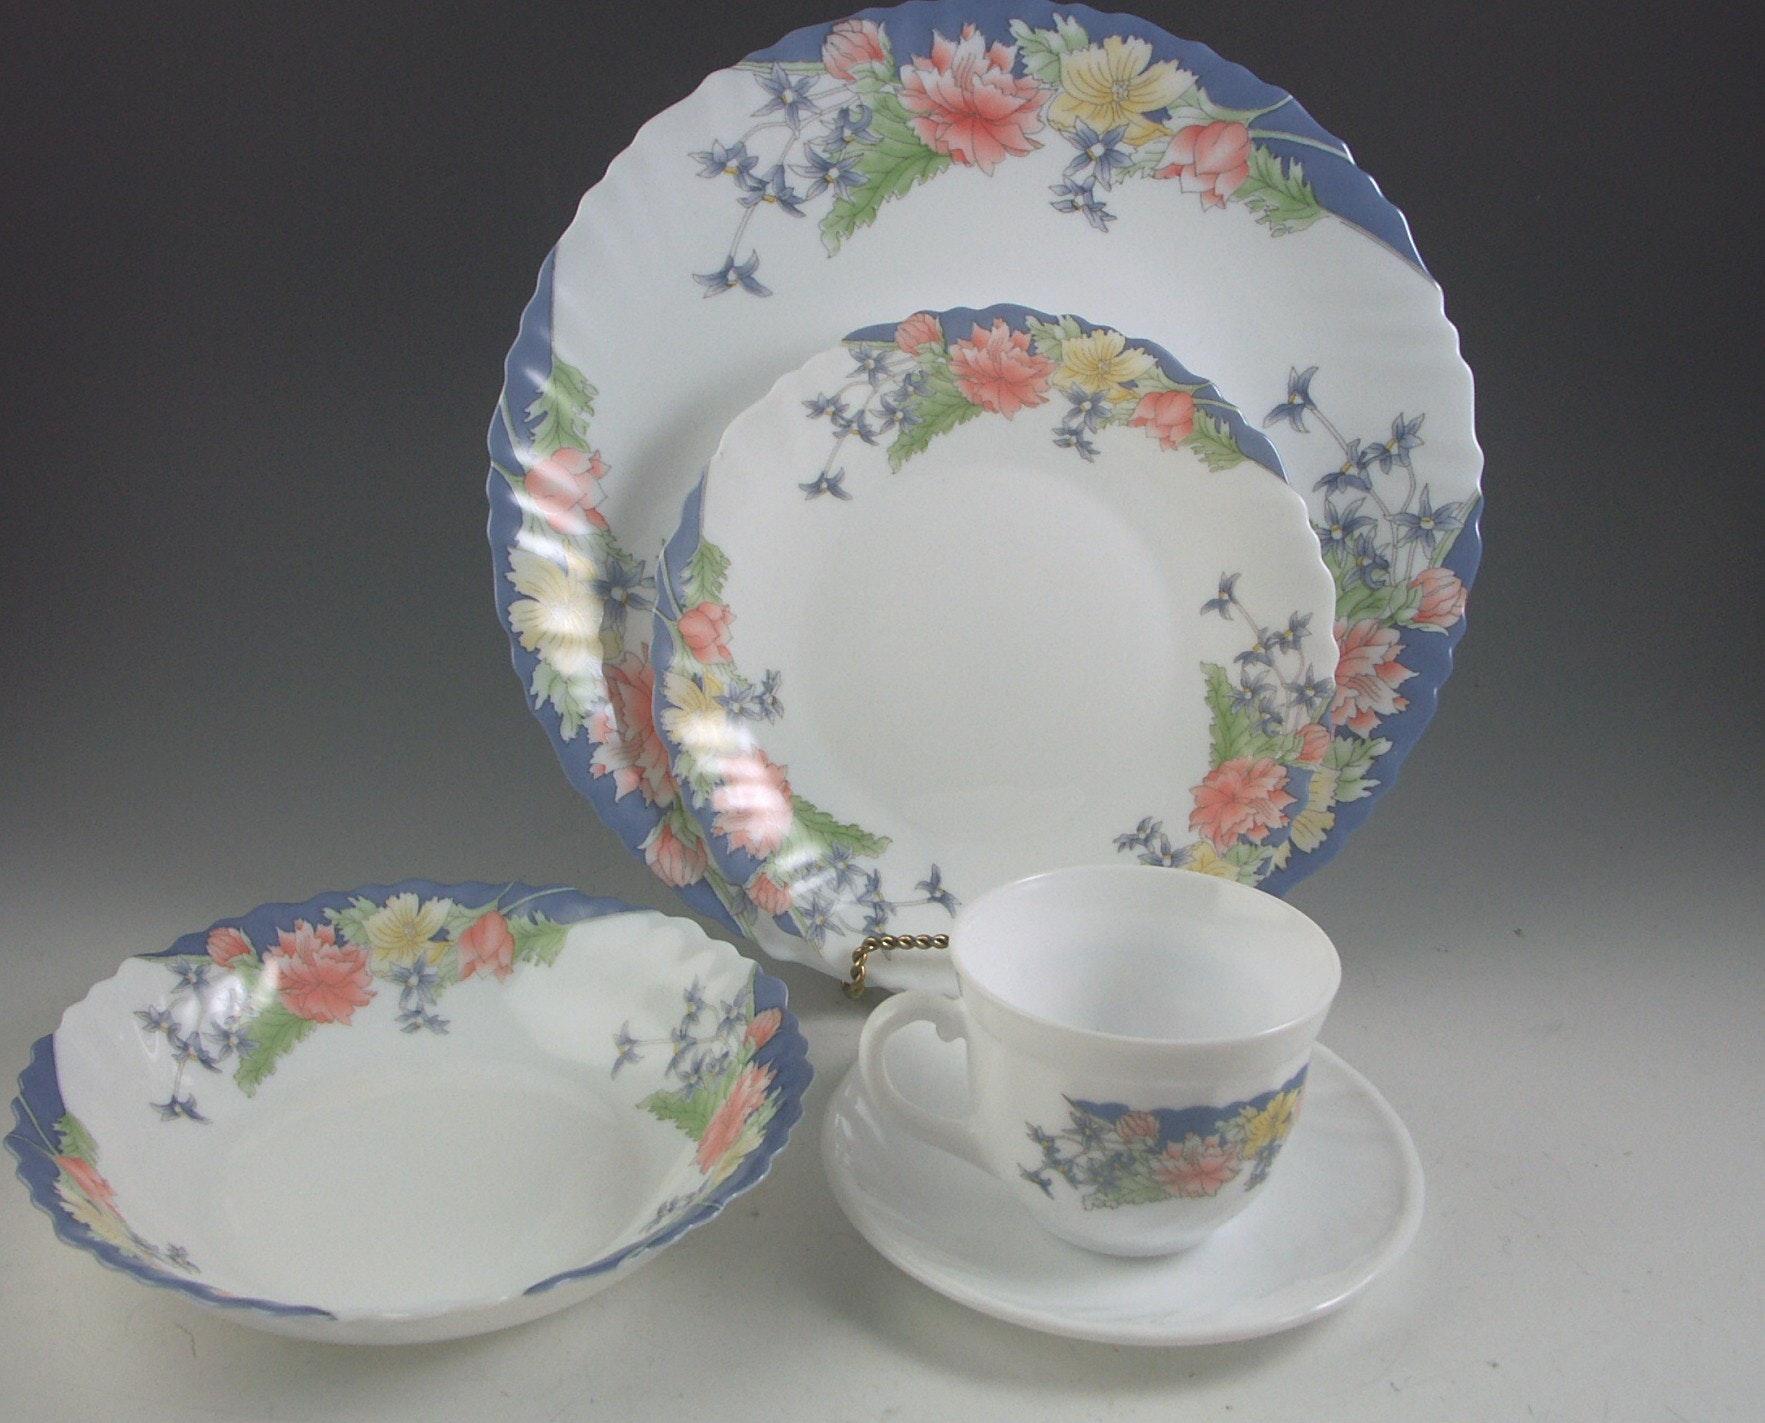 70 Piece Lot of Vintage Arcopal France Glass Dinnerware ... & 70 Piece Lot of Vintage Arcopal France Glass Dinnerware : EBTH